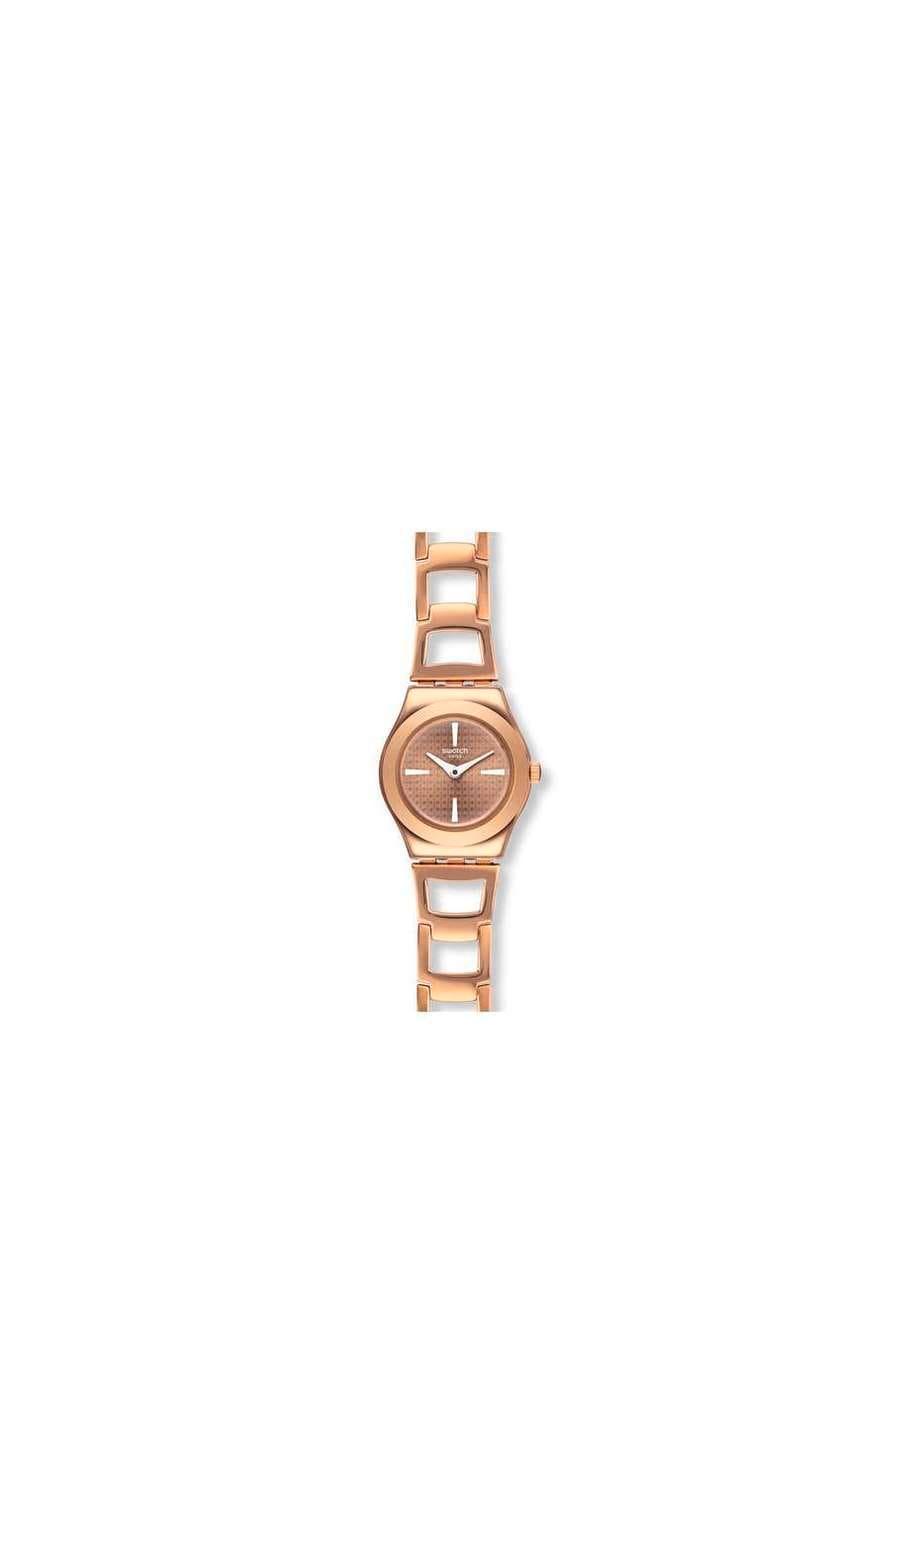 Swatch - ROSELI - 1